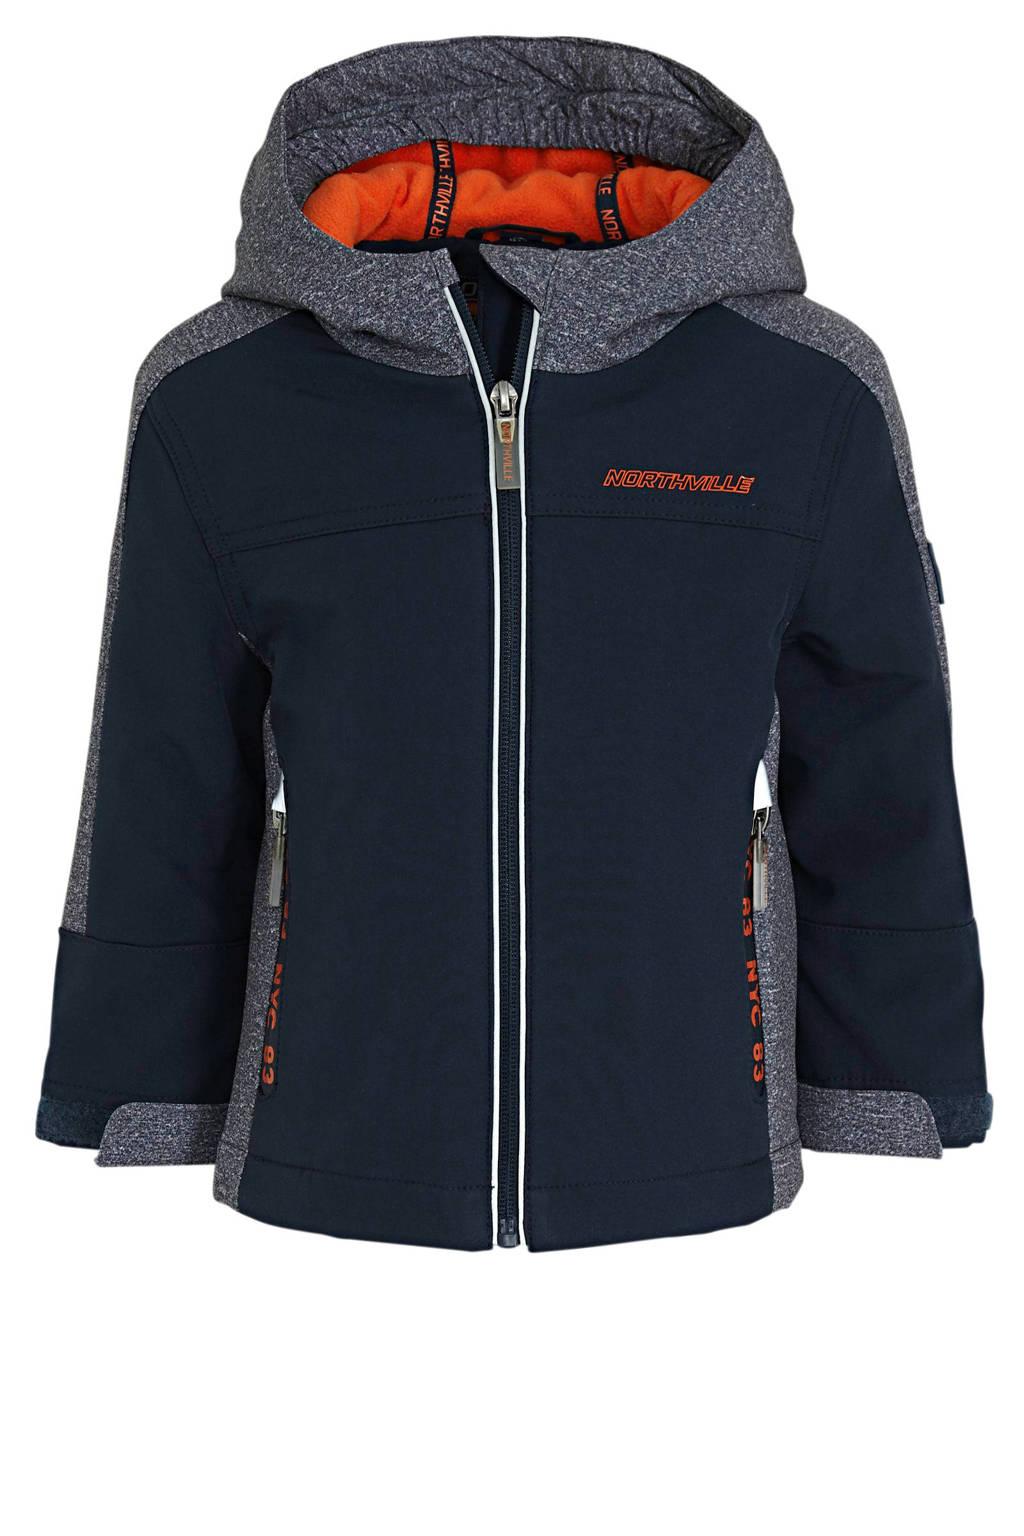 C&A Palomino softshell jas donkerblauw/oranje, Donkerblauw/oranje